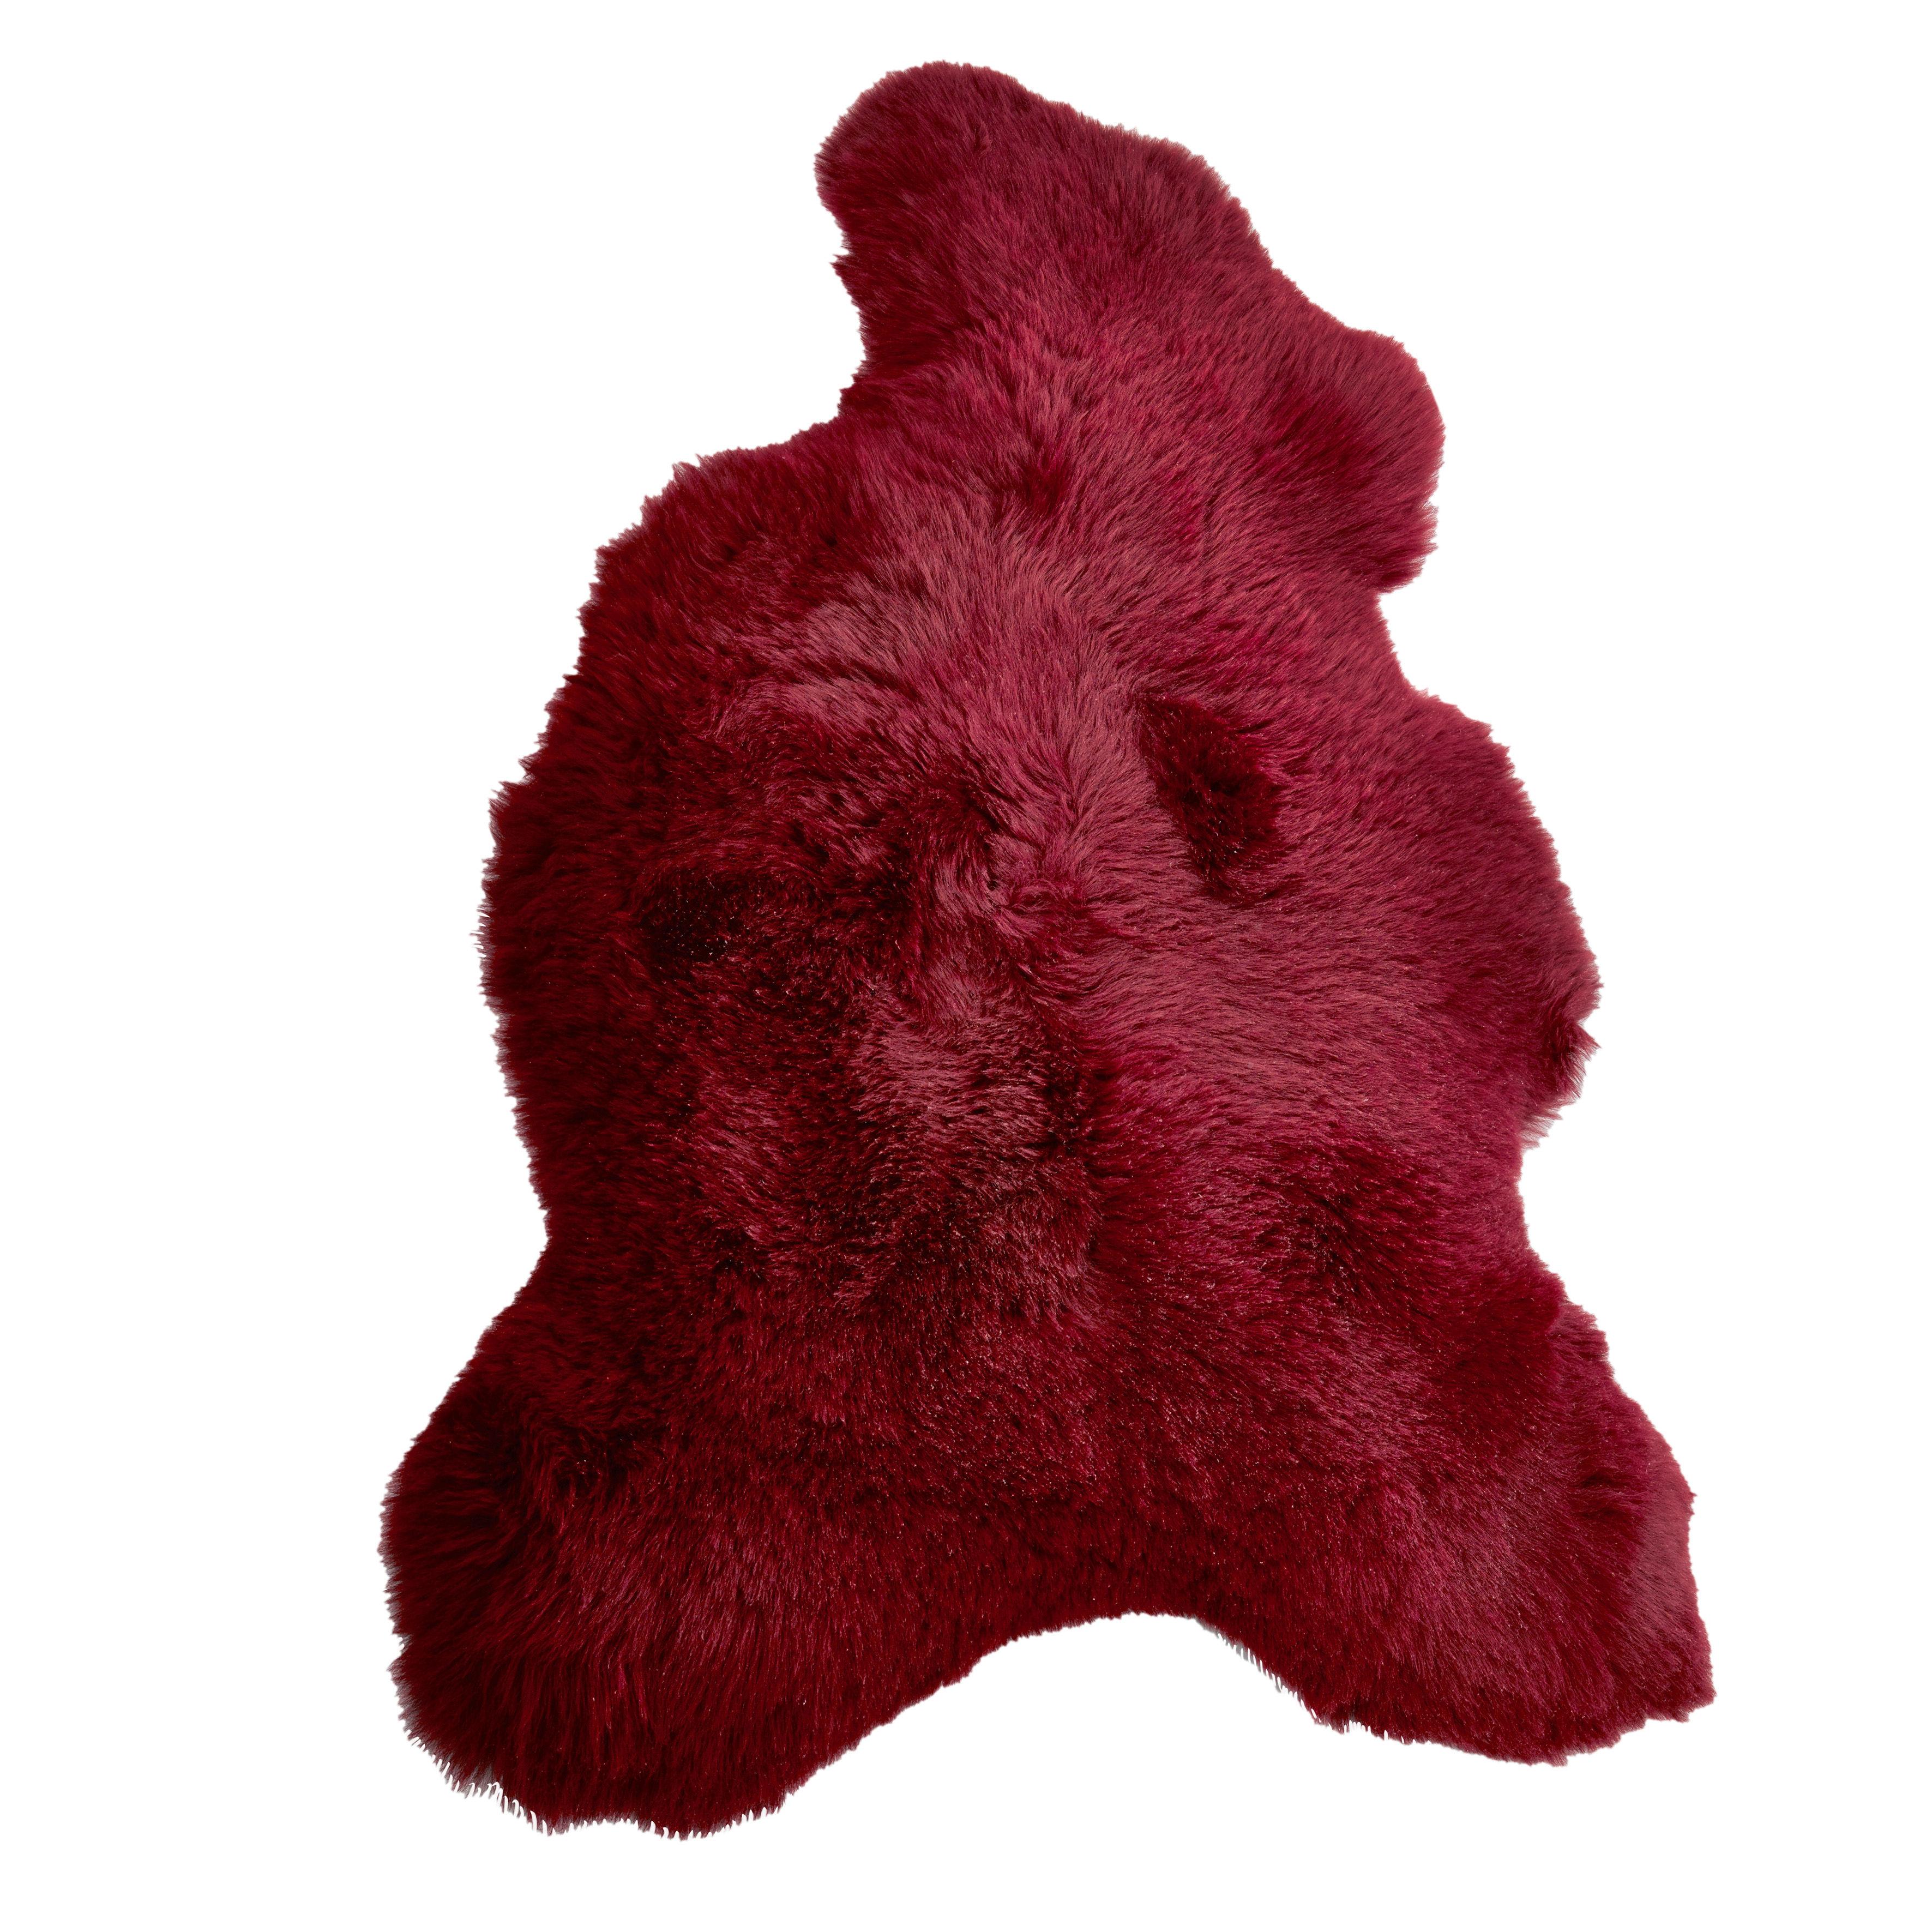 Interni - Tappeti - Pelle di pecora - vera / 100 x 70 cm di Pols Potten - Bordò - Peau de mouton teintée